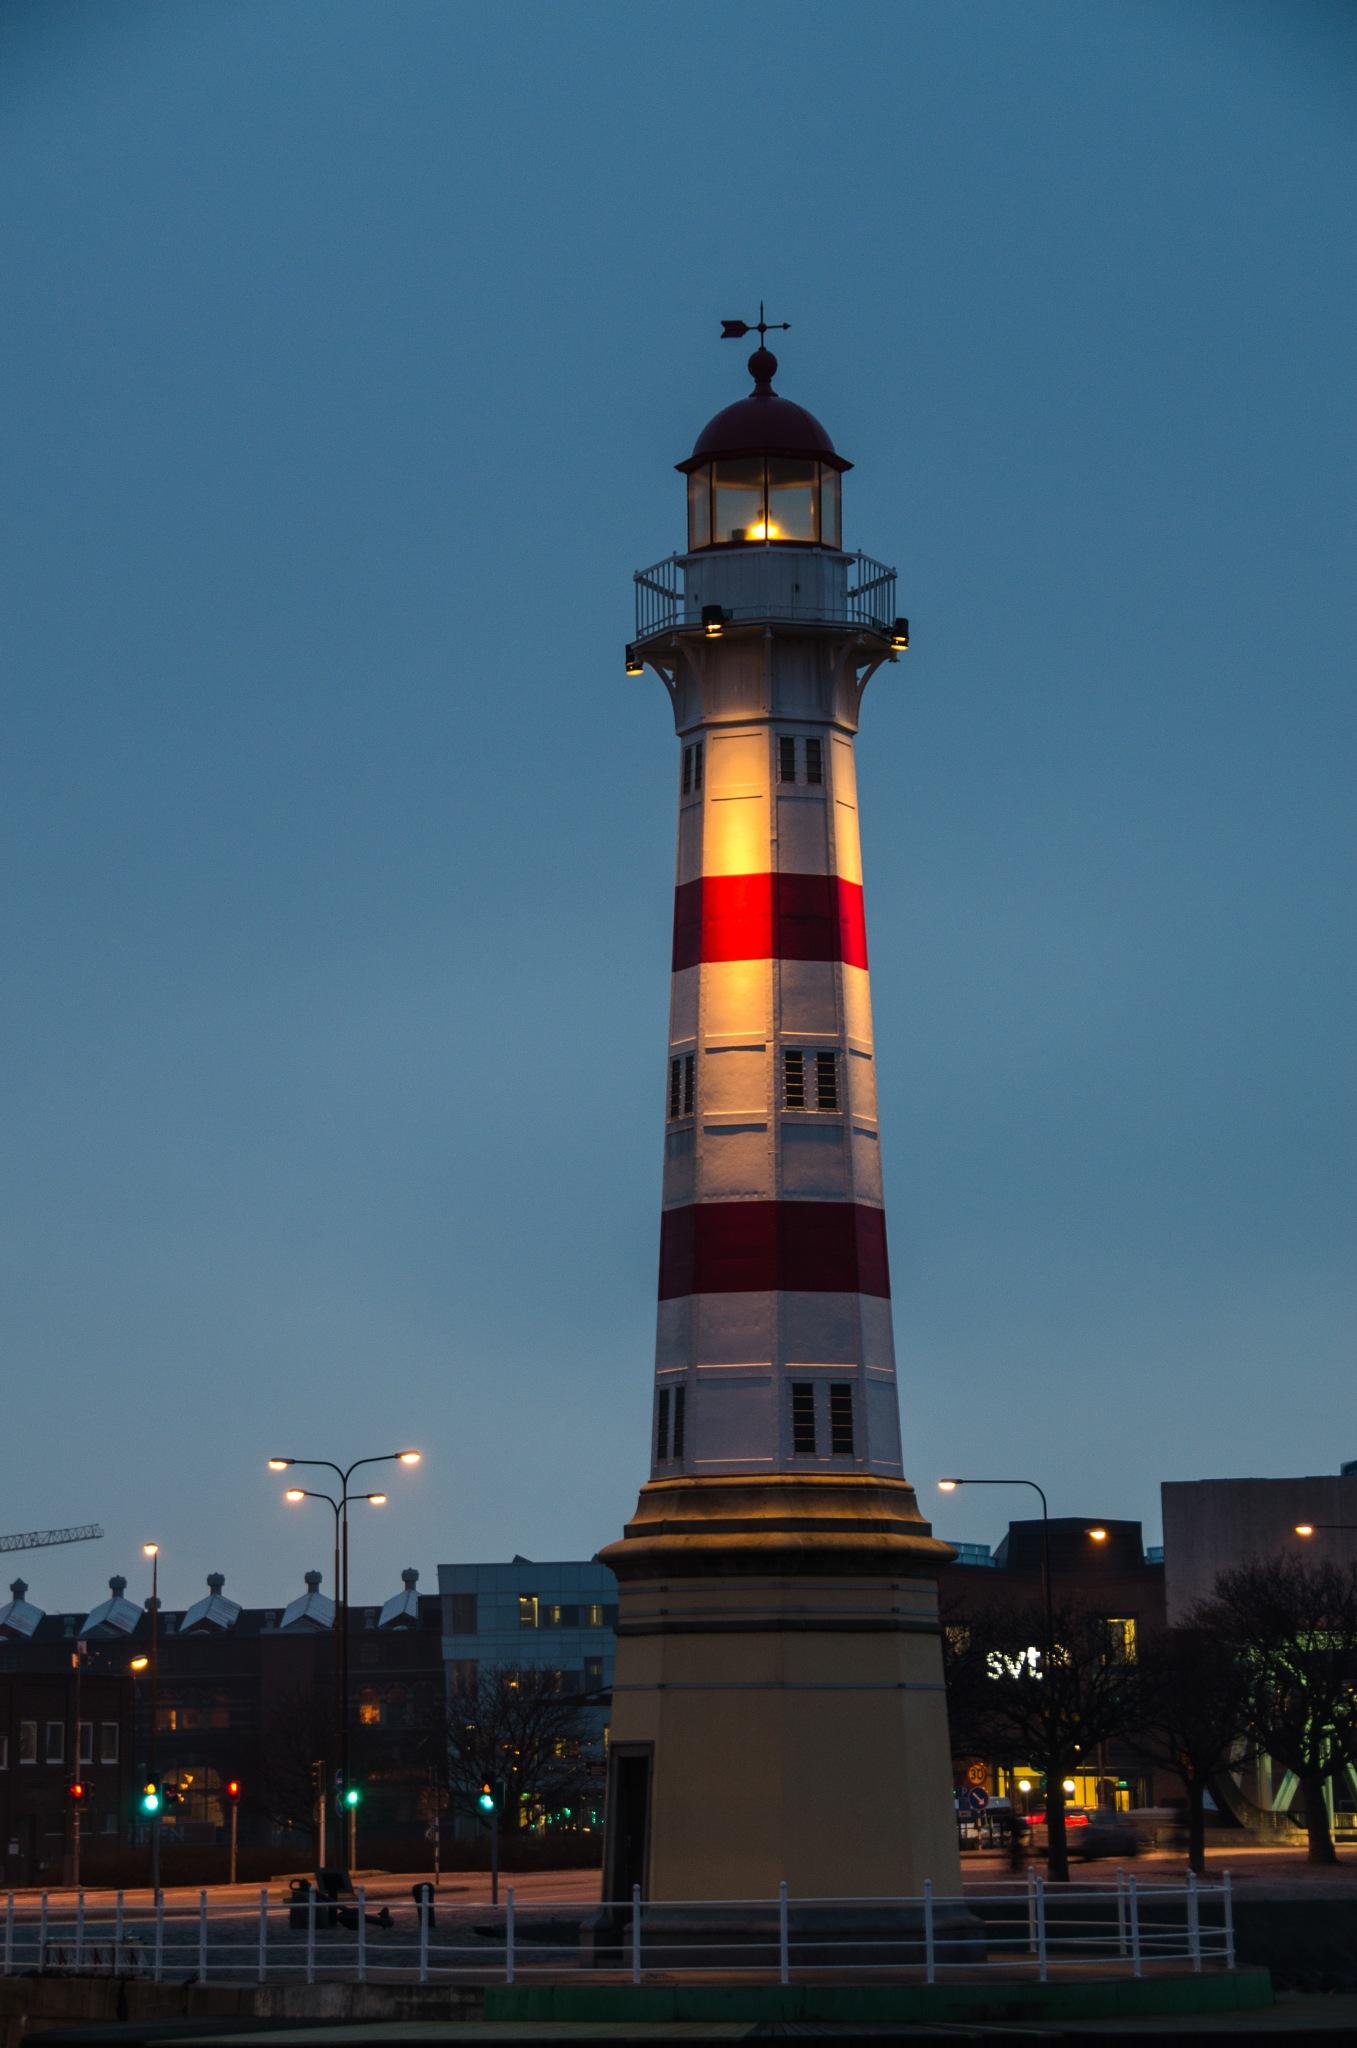 Lighthouse by kristina.truedsson